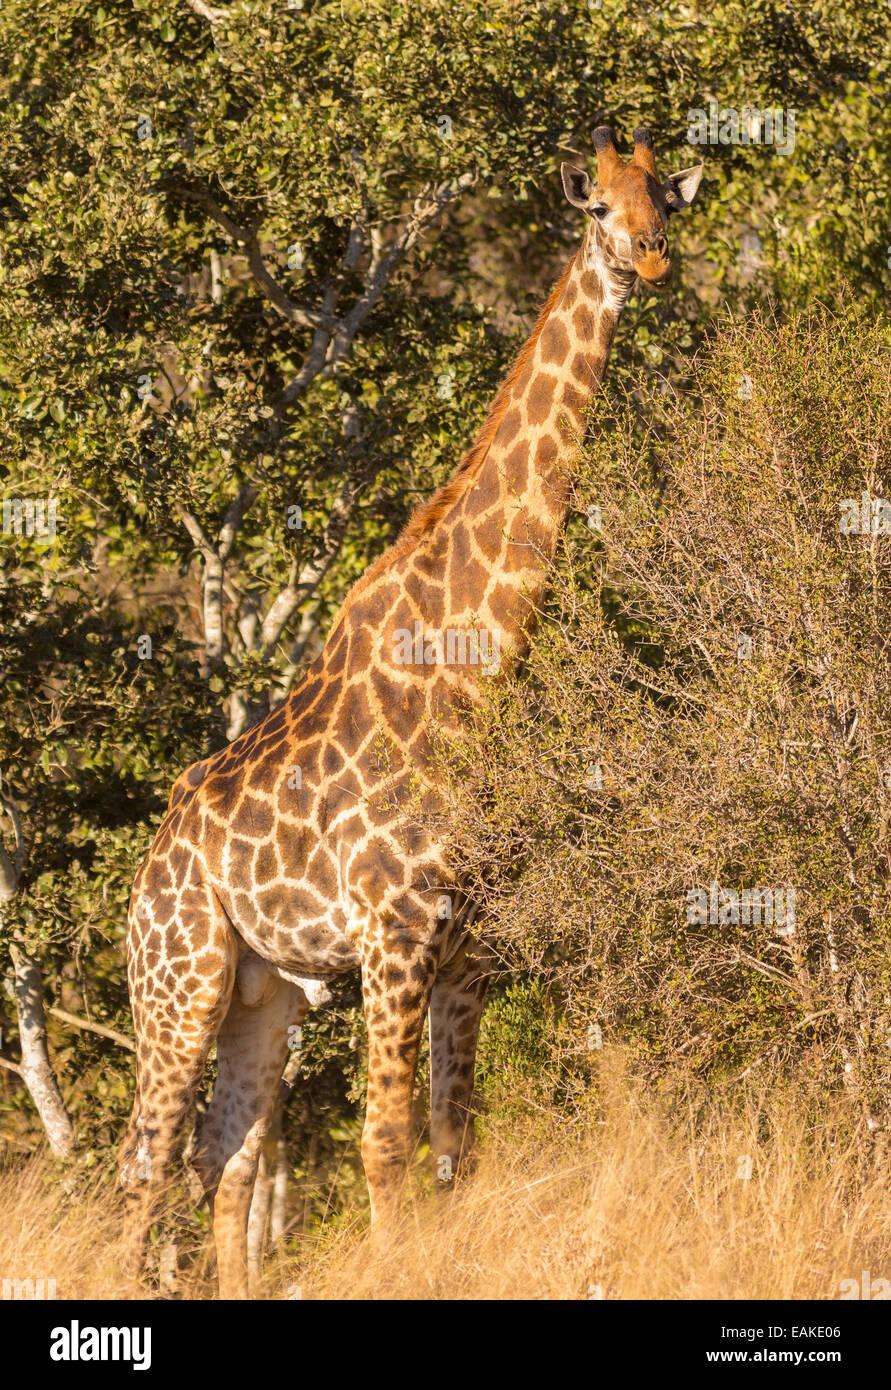 KRUGER NATIONAL PARK, SOUTH AFRICA - Giraffe in bush. - Stock Image